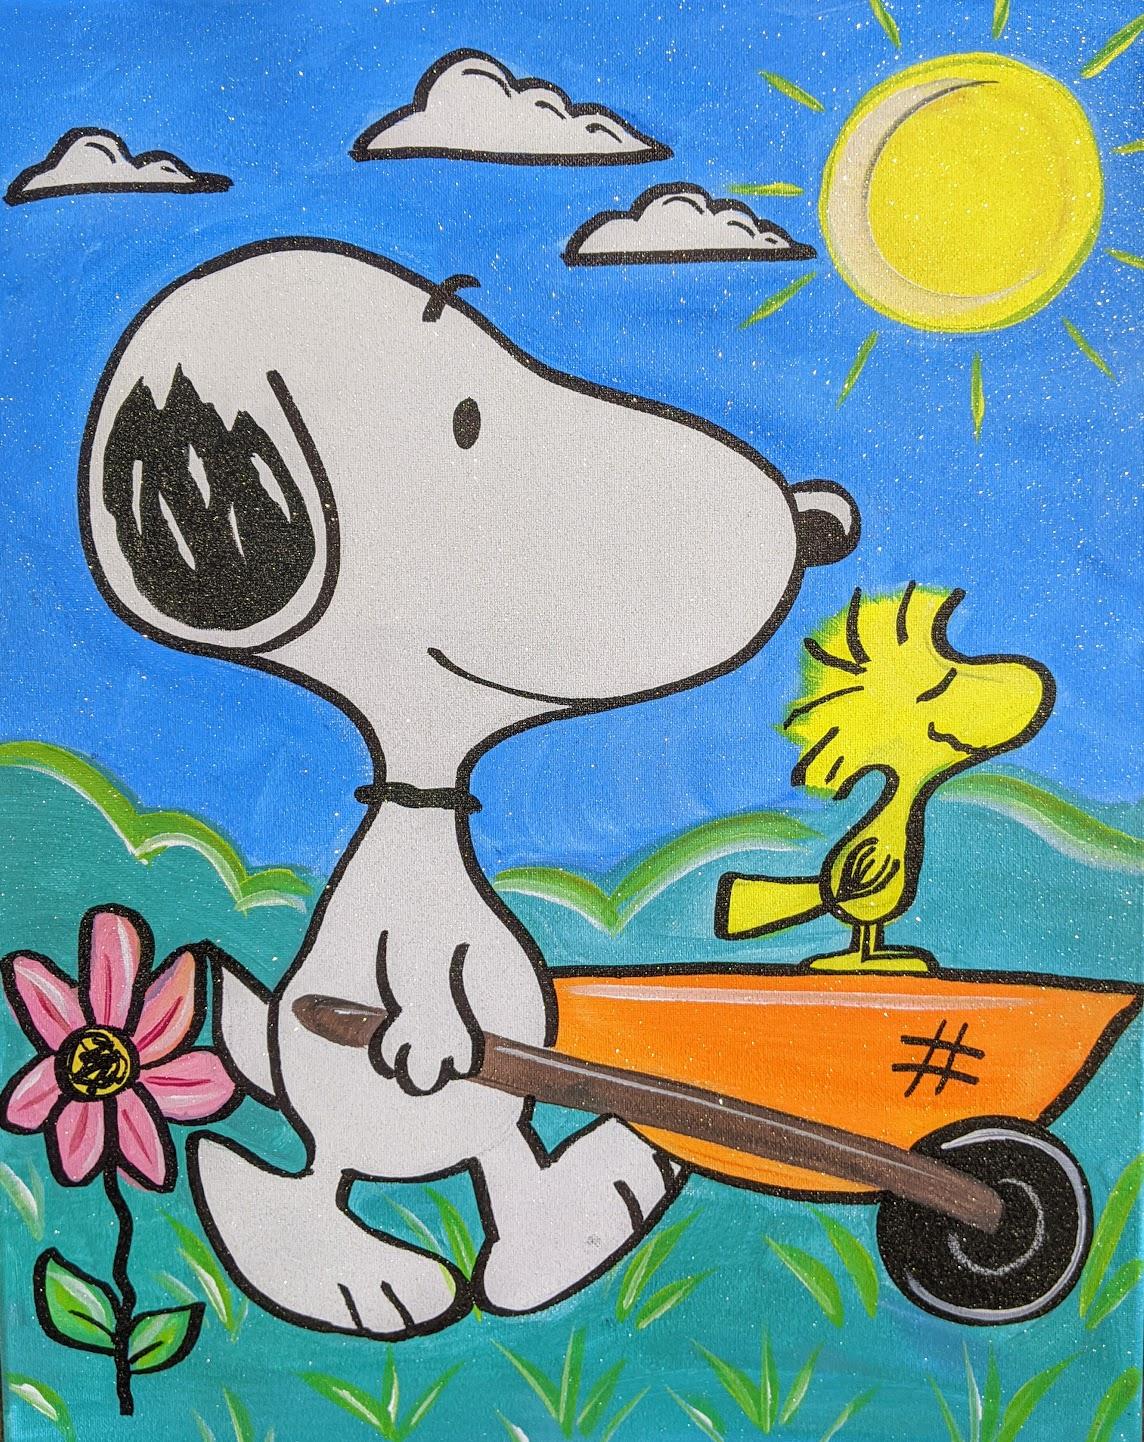 Spring Snoopy